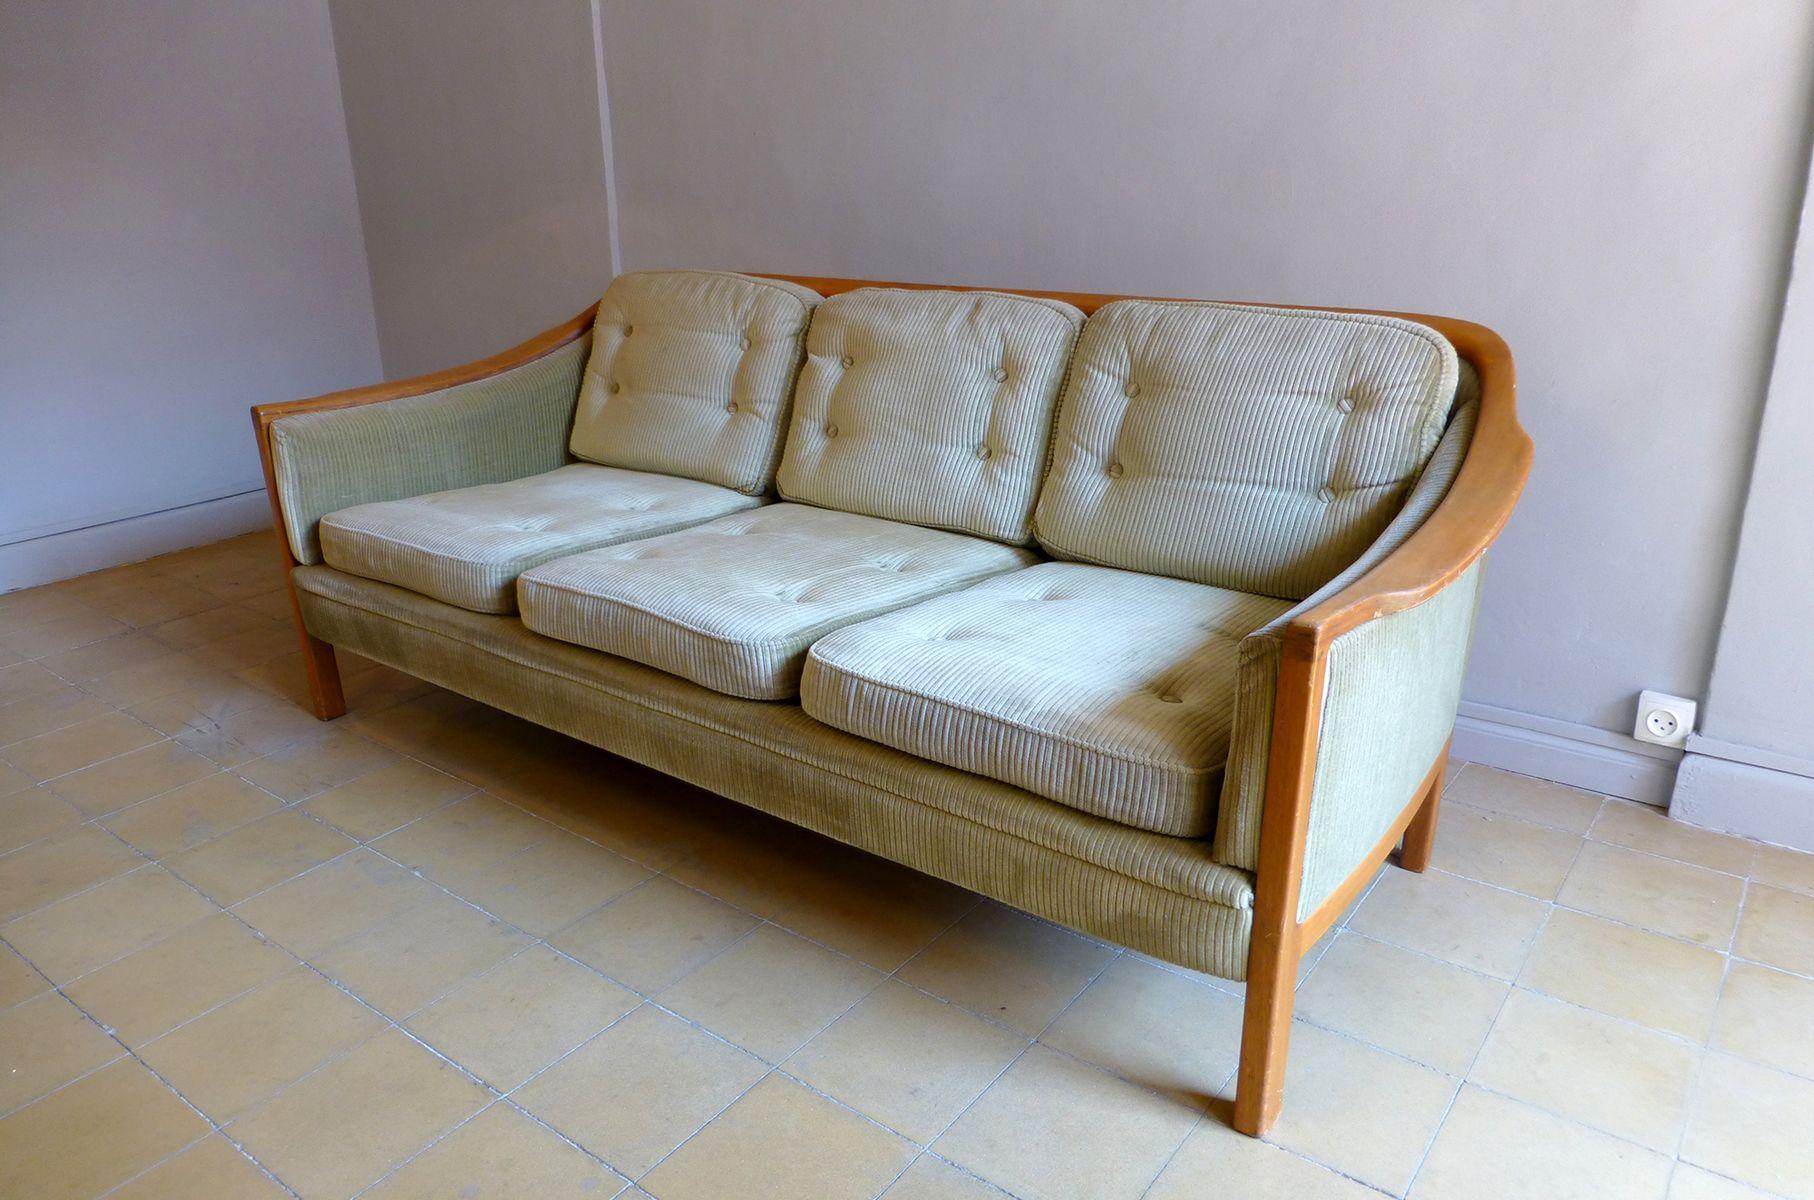 Swedish Corduroy Three Seater Sofa 1950 For Sale At Pamono